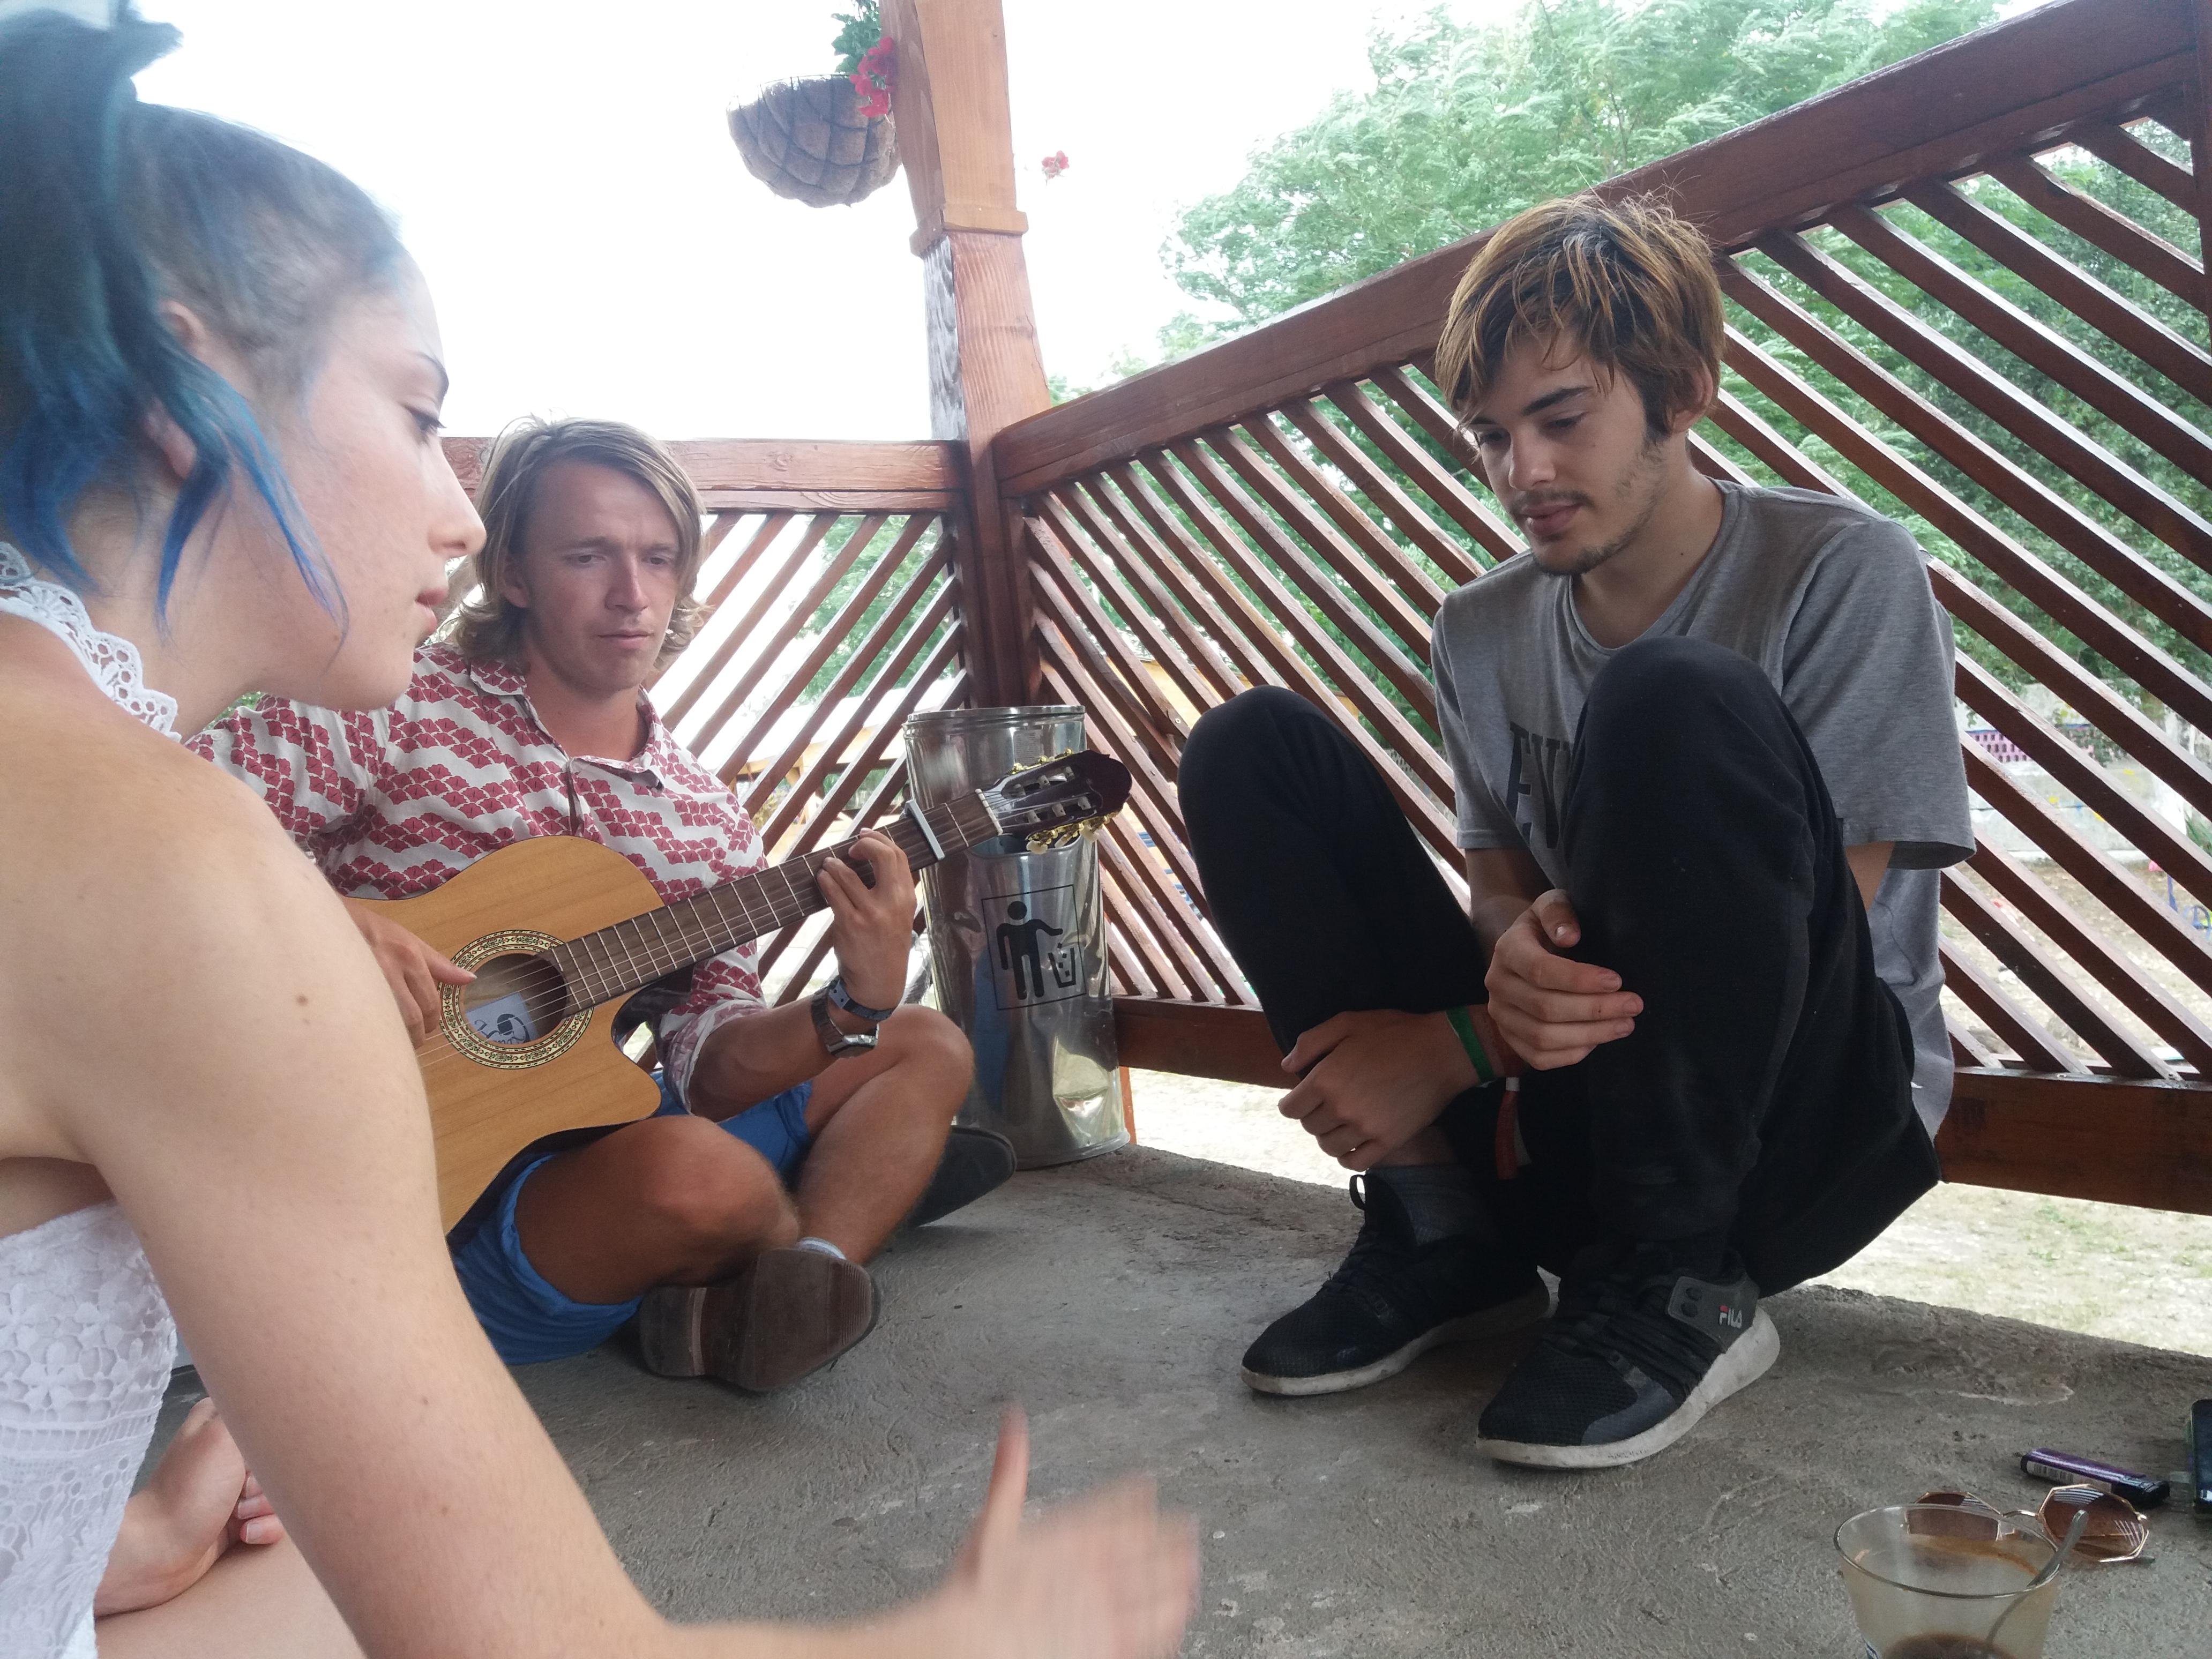 nooretevahetus youth exchange nyh romania rumeenia estonia eesti roma